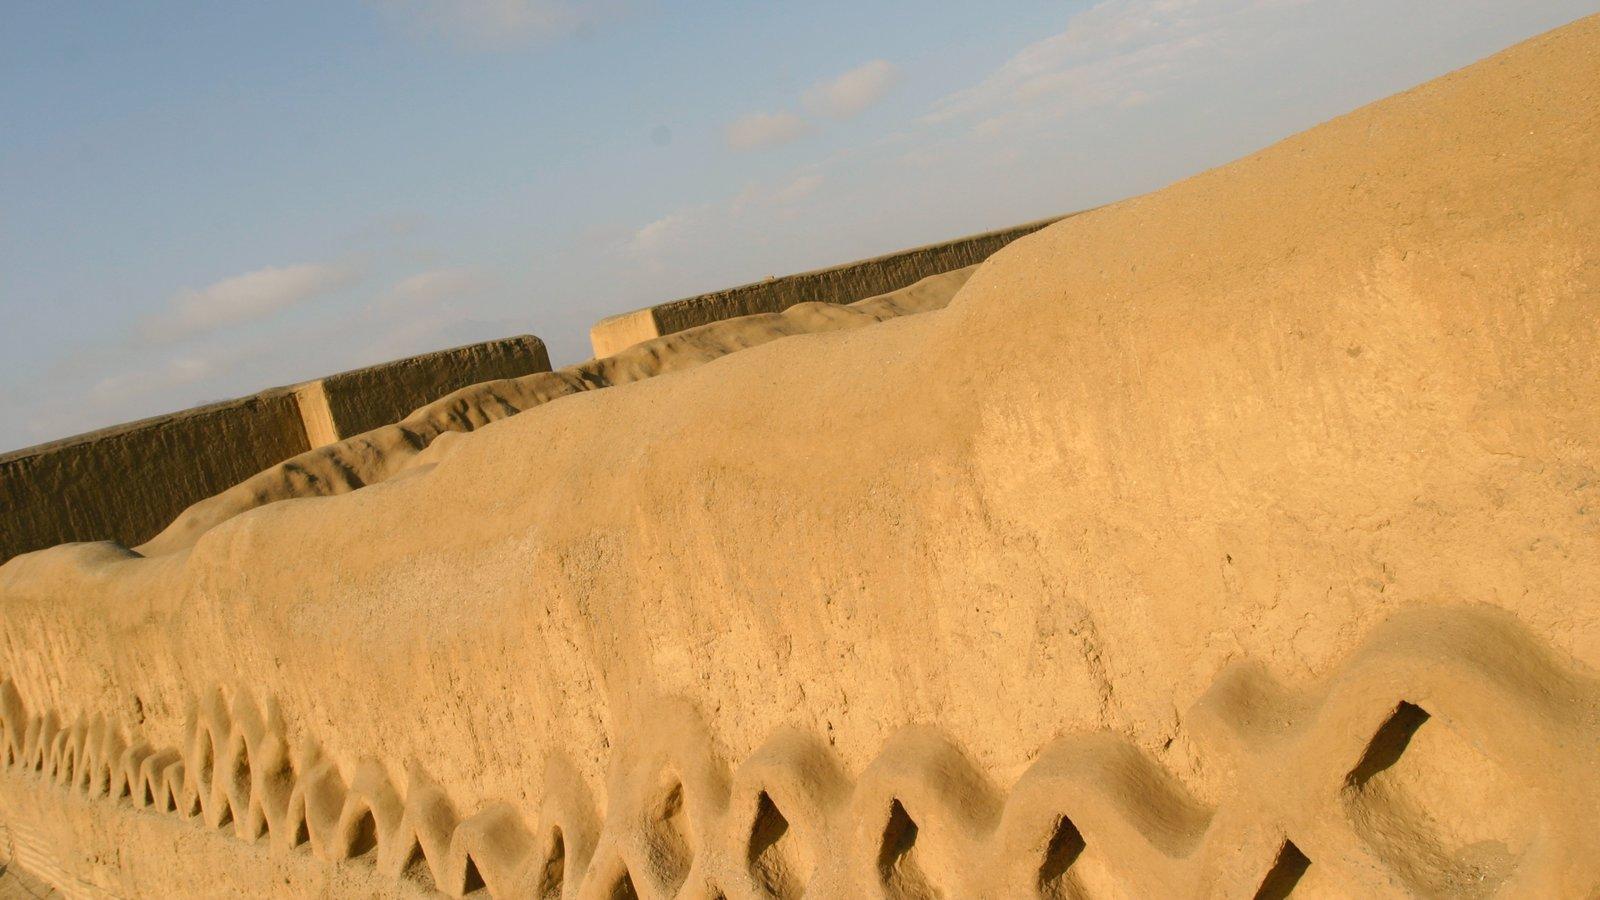 Chan Chan mostrando elementos de patrimônio e ruínas de edifício